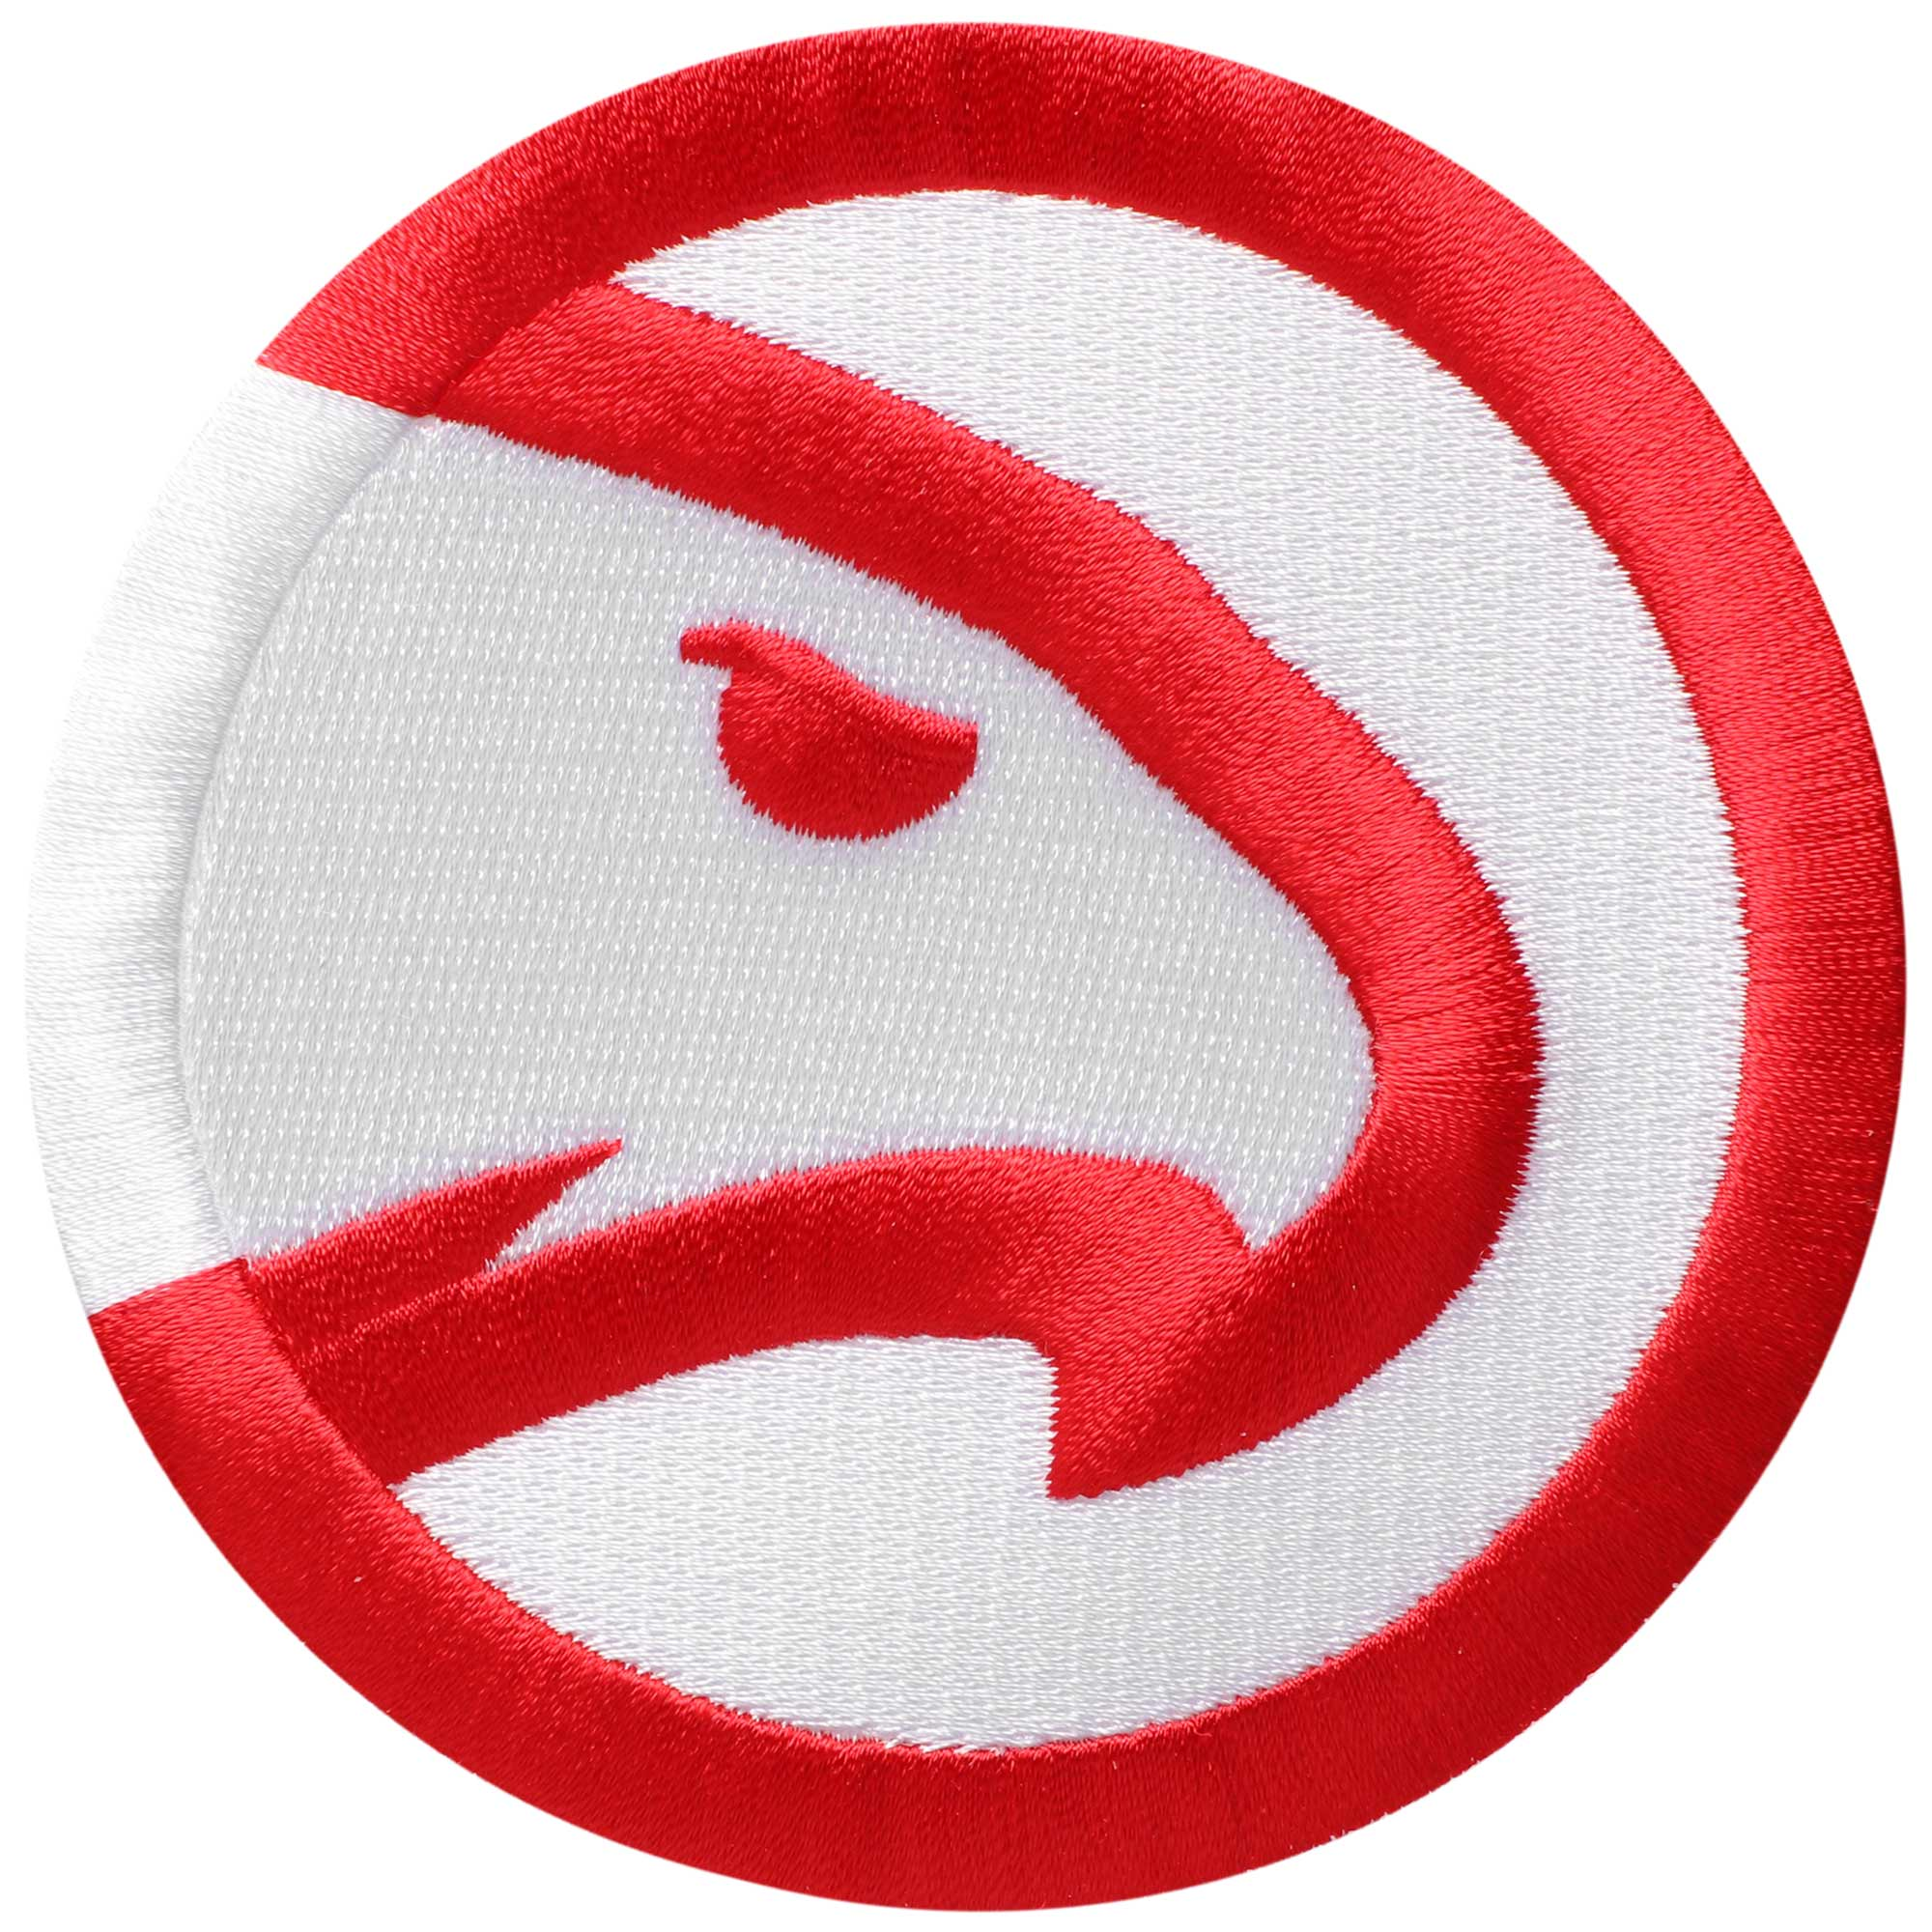 Atlanta Hawks Team Patch - No Size